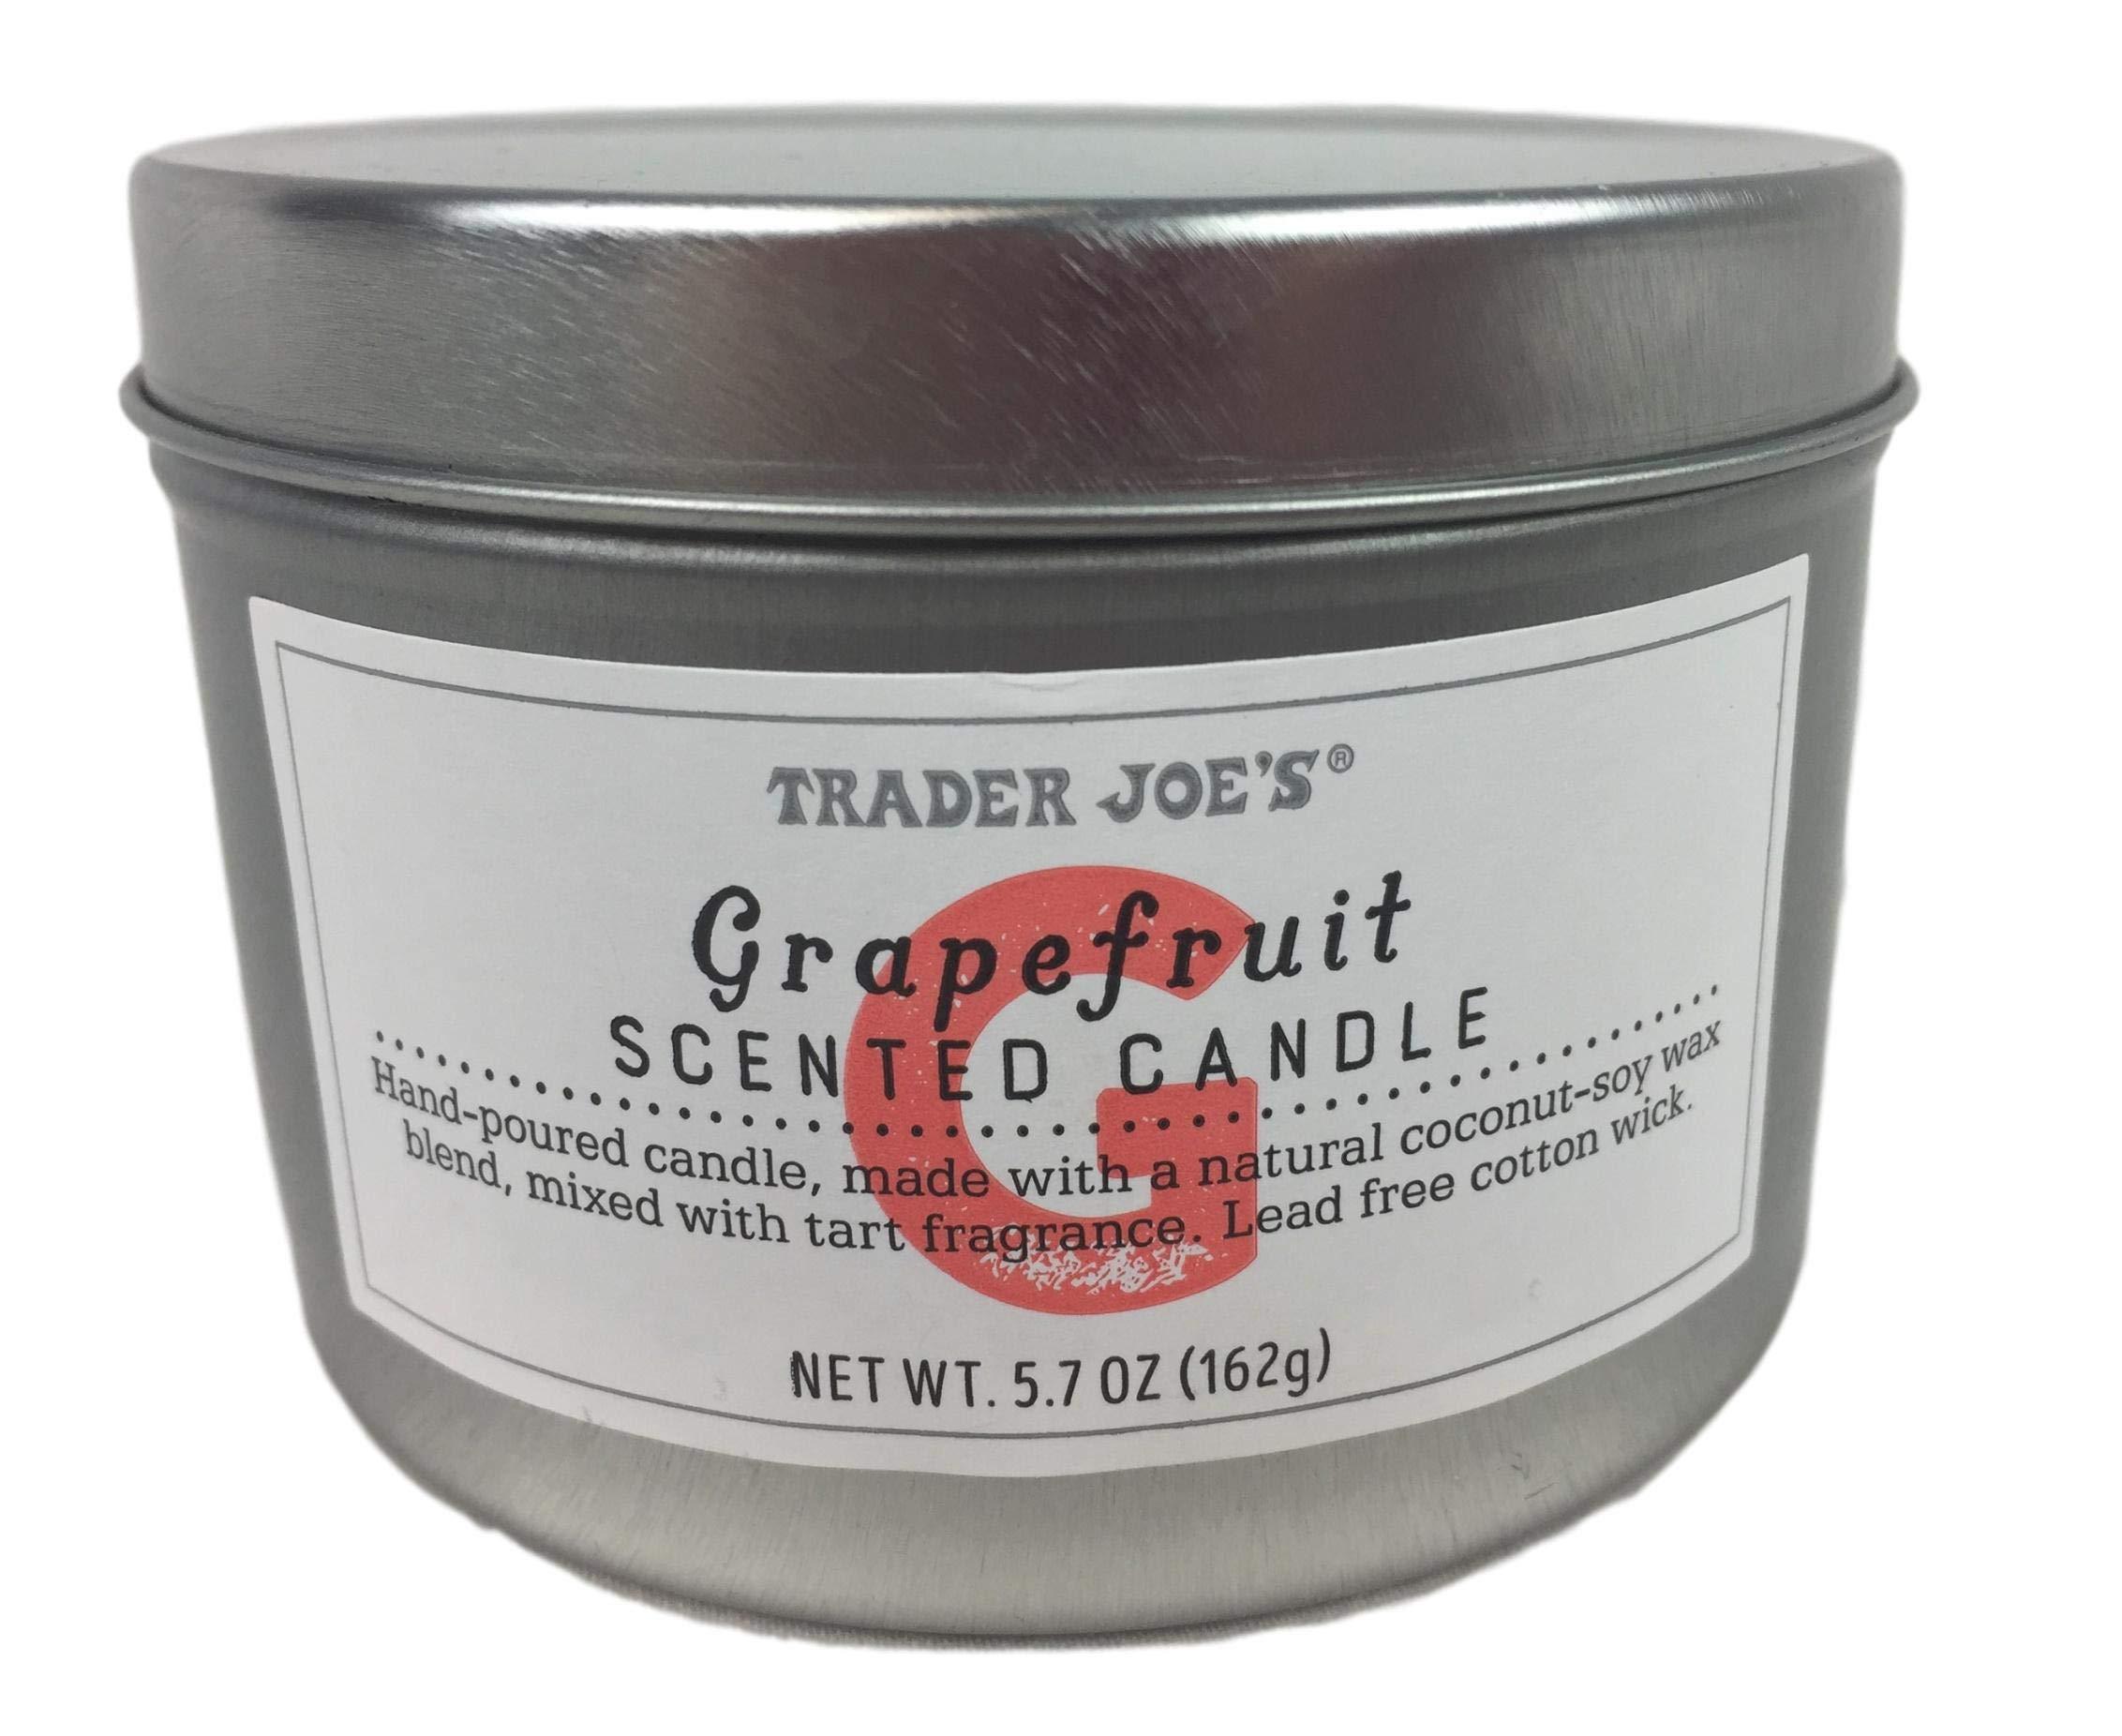 Trader Joe's - Trader Joe's Grapefruit Scented Candle NET WT 5.7 OZ (162g)